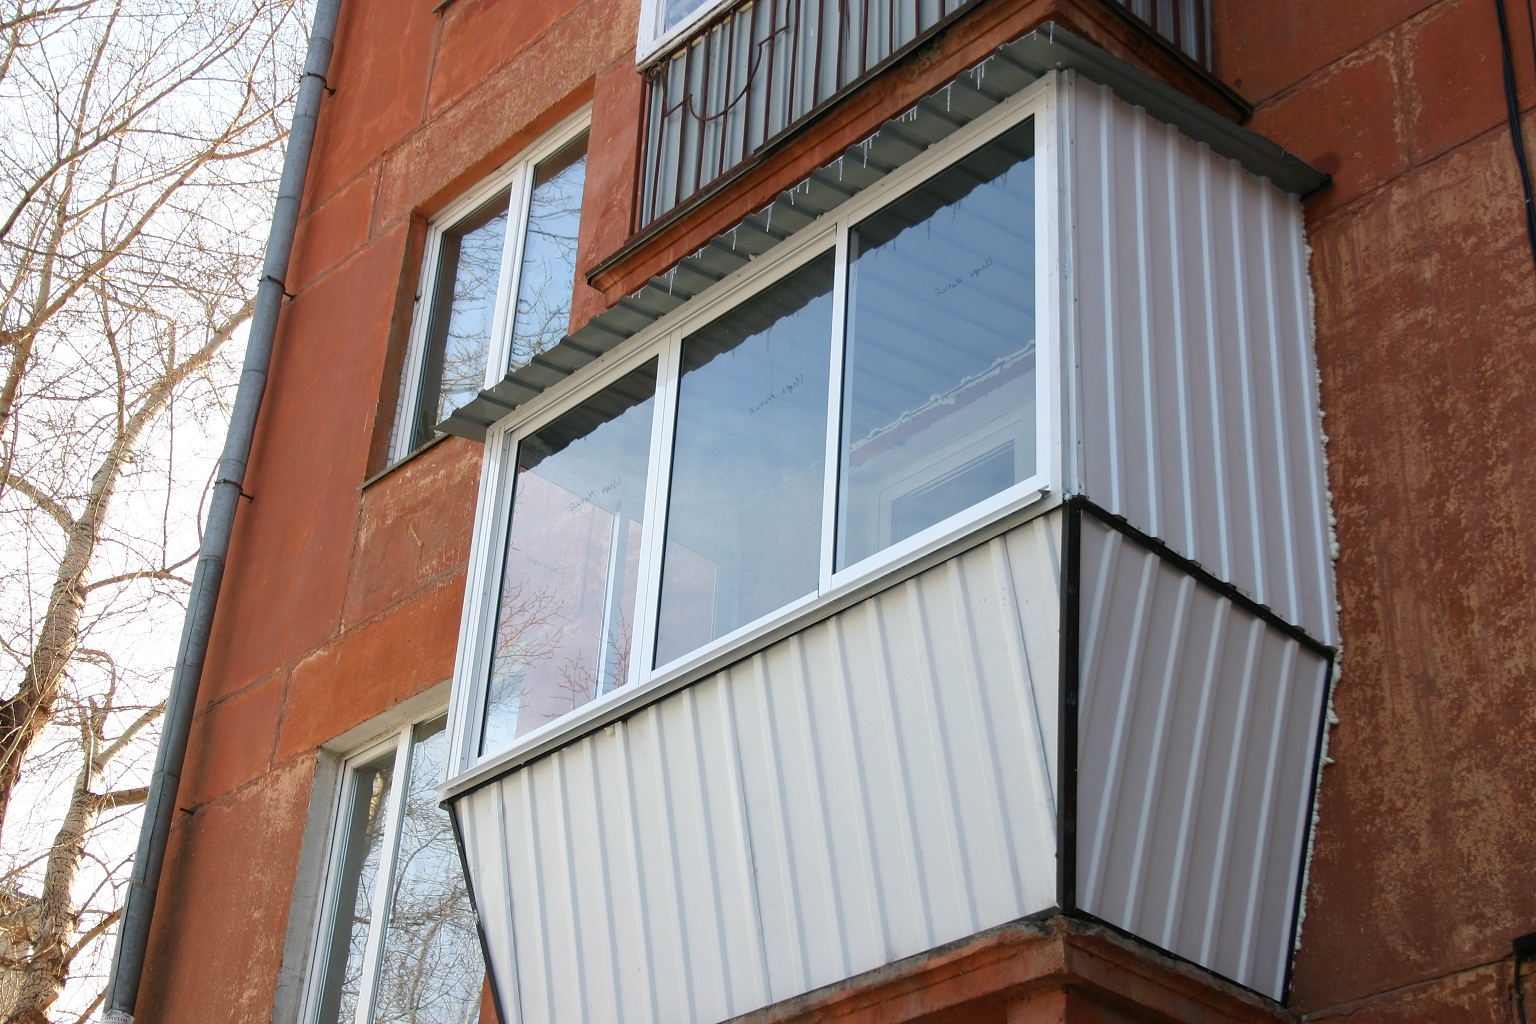 Остекление балкона румЯнцева 11.